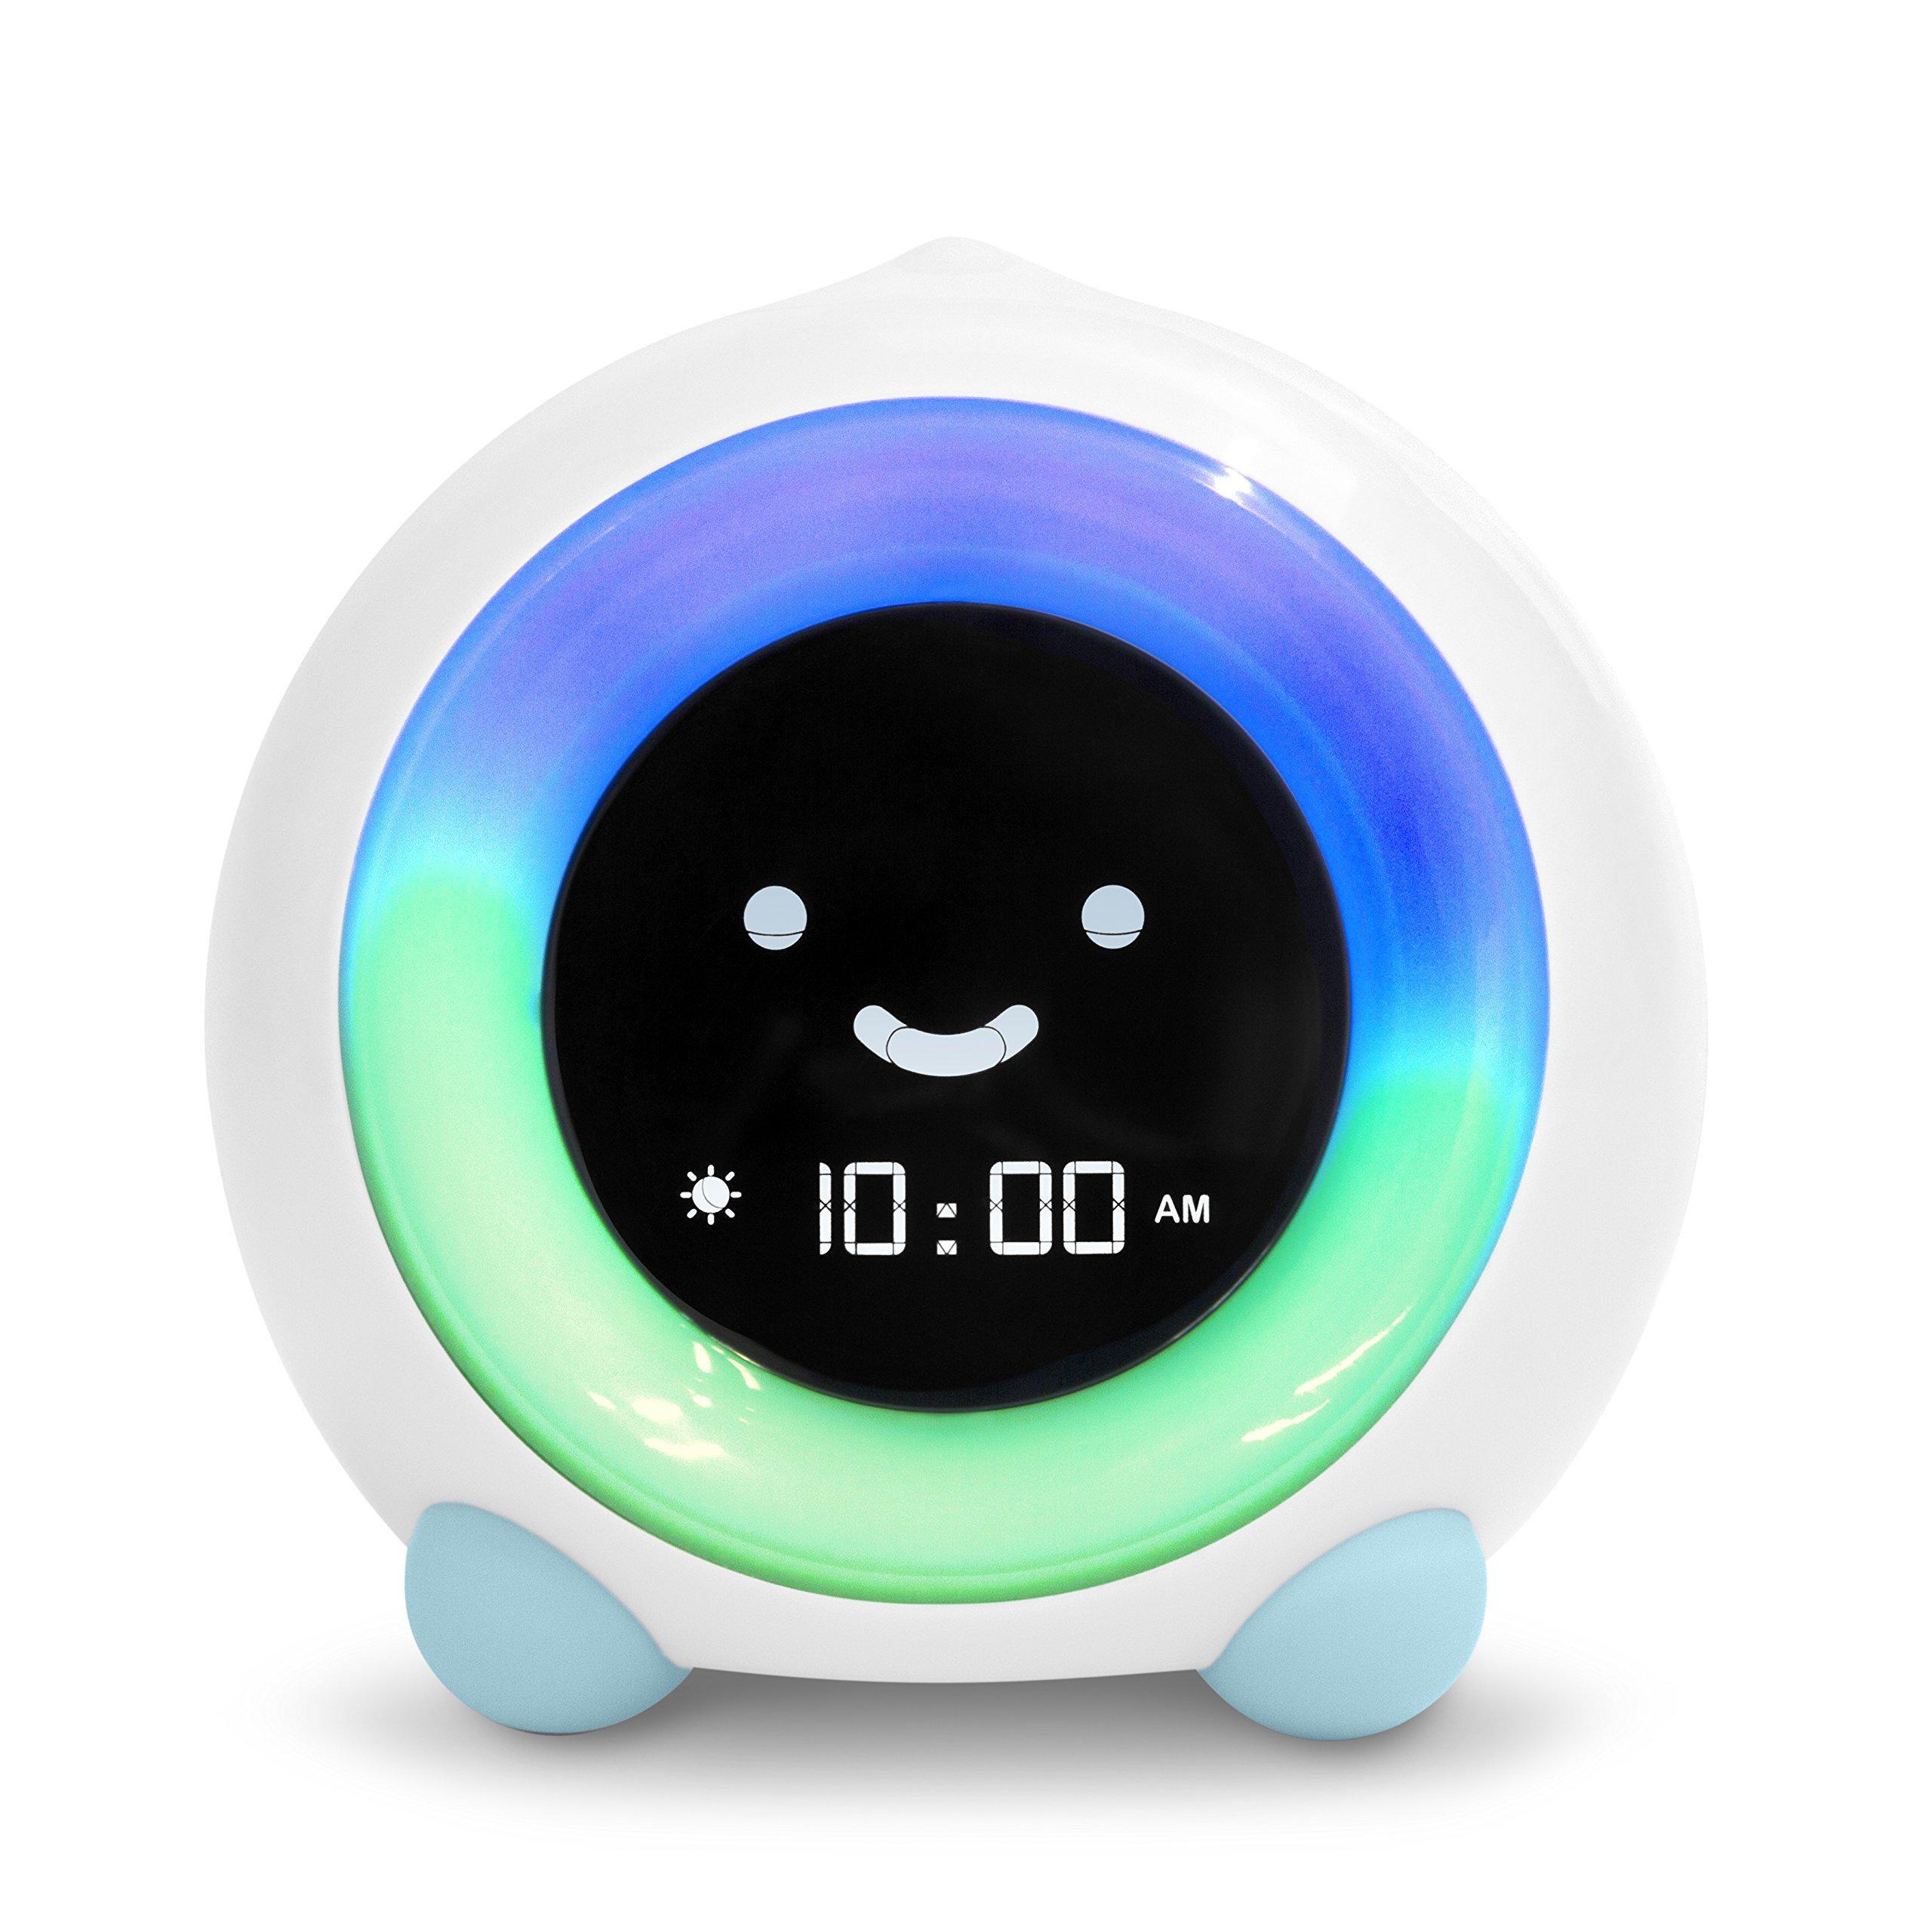 LittleHippo Mella Ready to Rise Children's Sleep Trainer, Alarm Clock, Night Light Sleep Sounds Machine